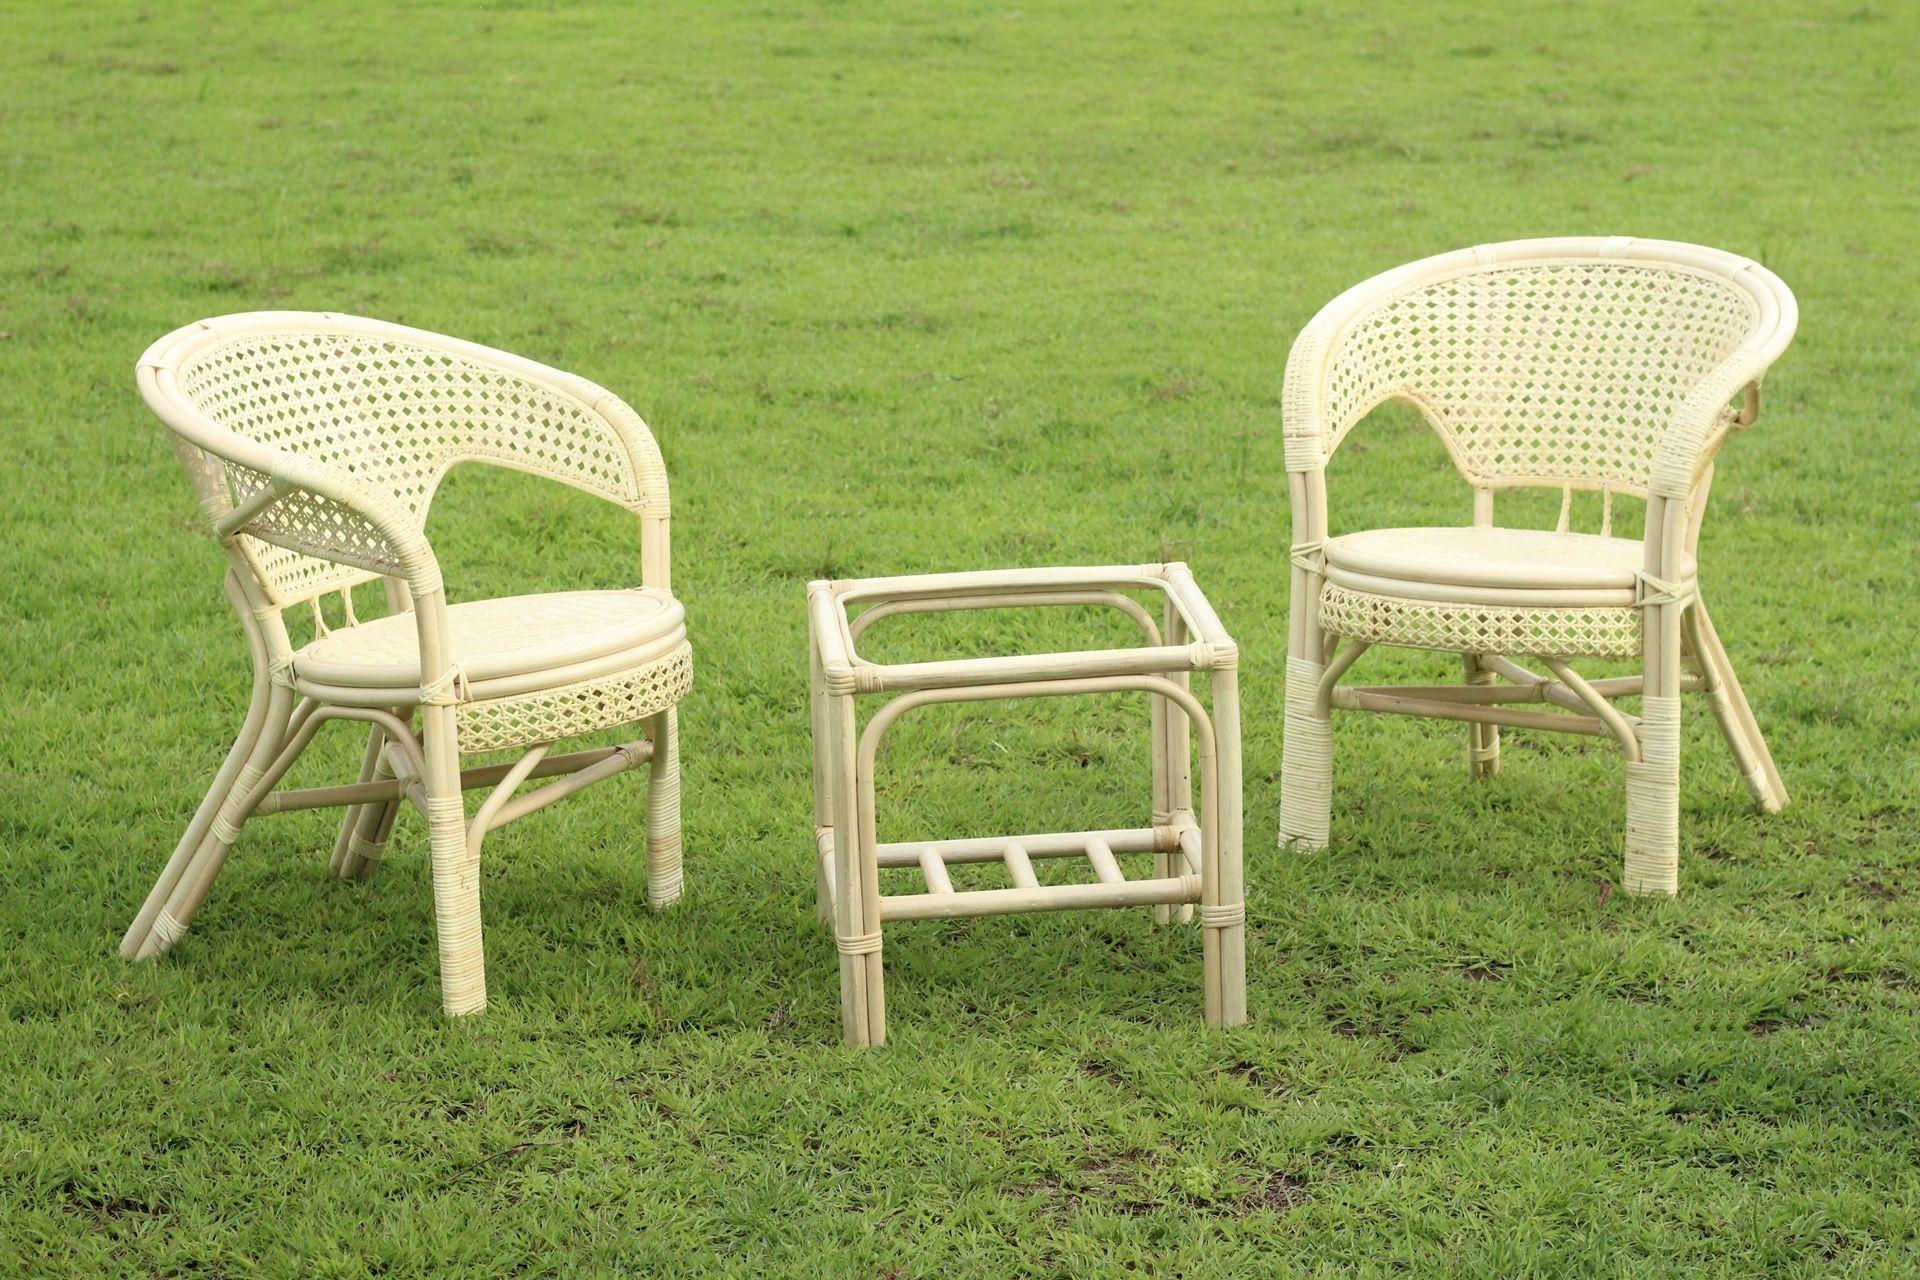 Outdoor Rattan Patio Furniture Set